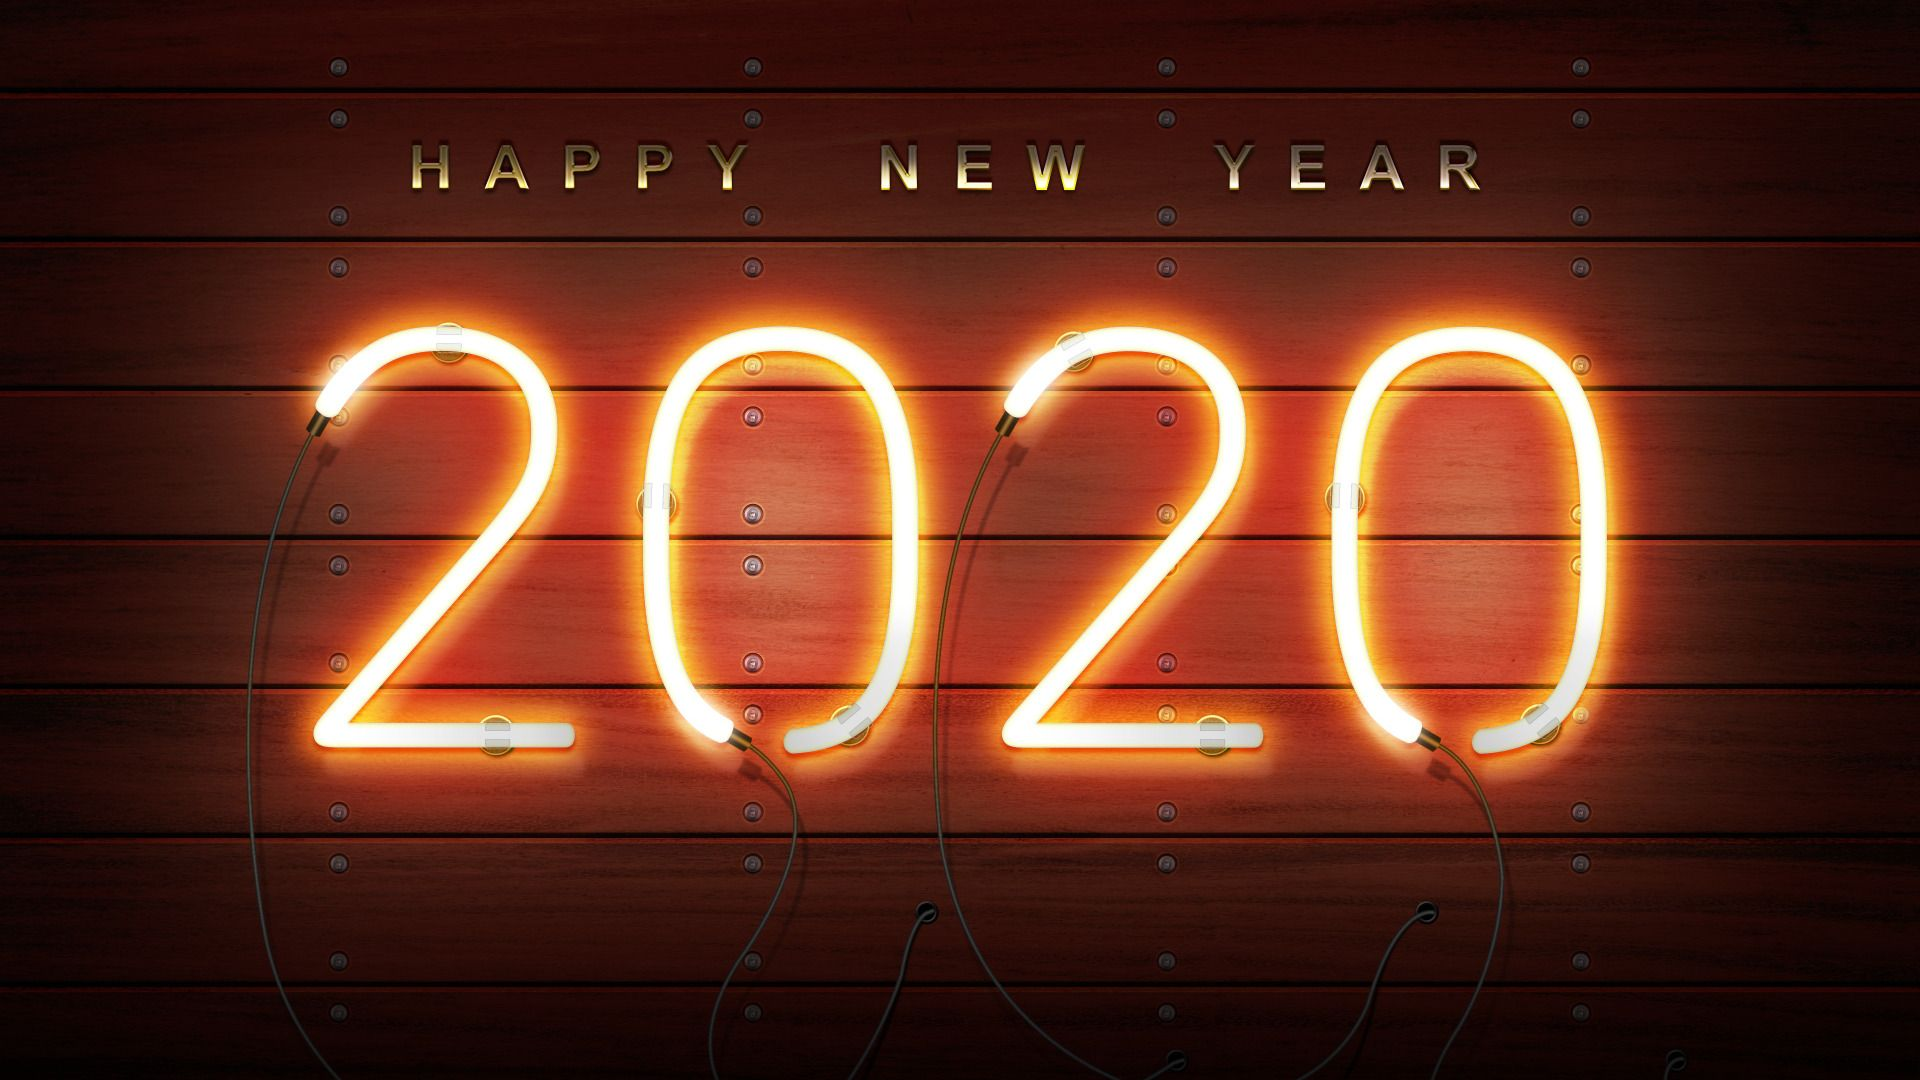 Winter 2020 1920x1080 wallpaper